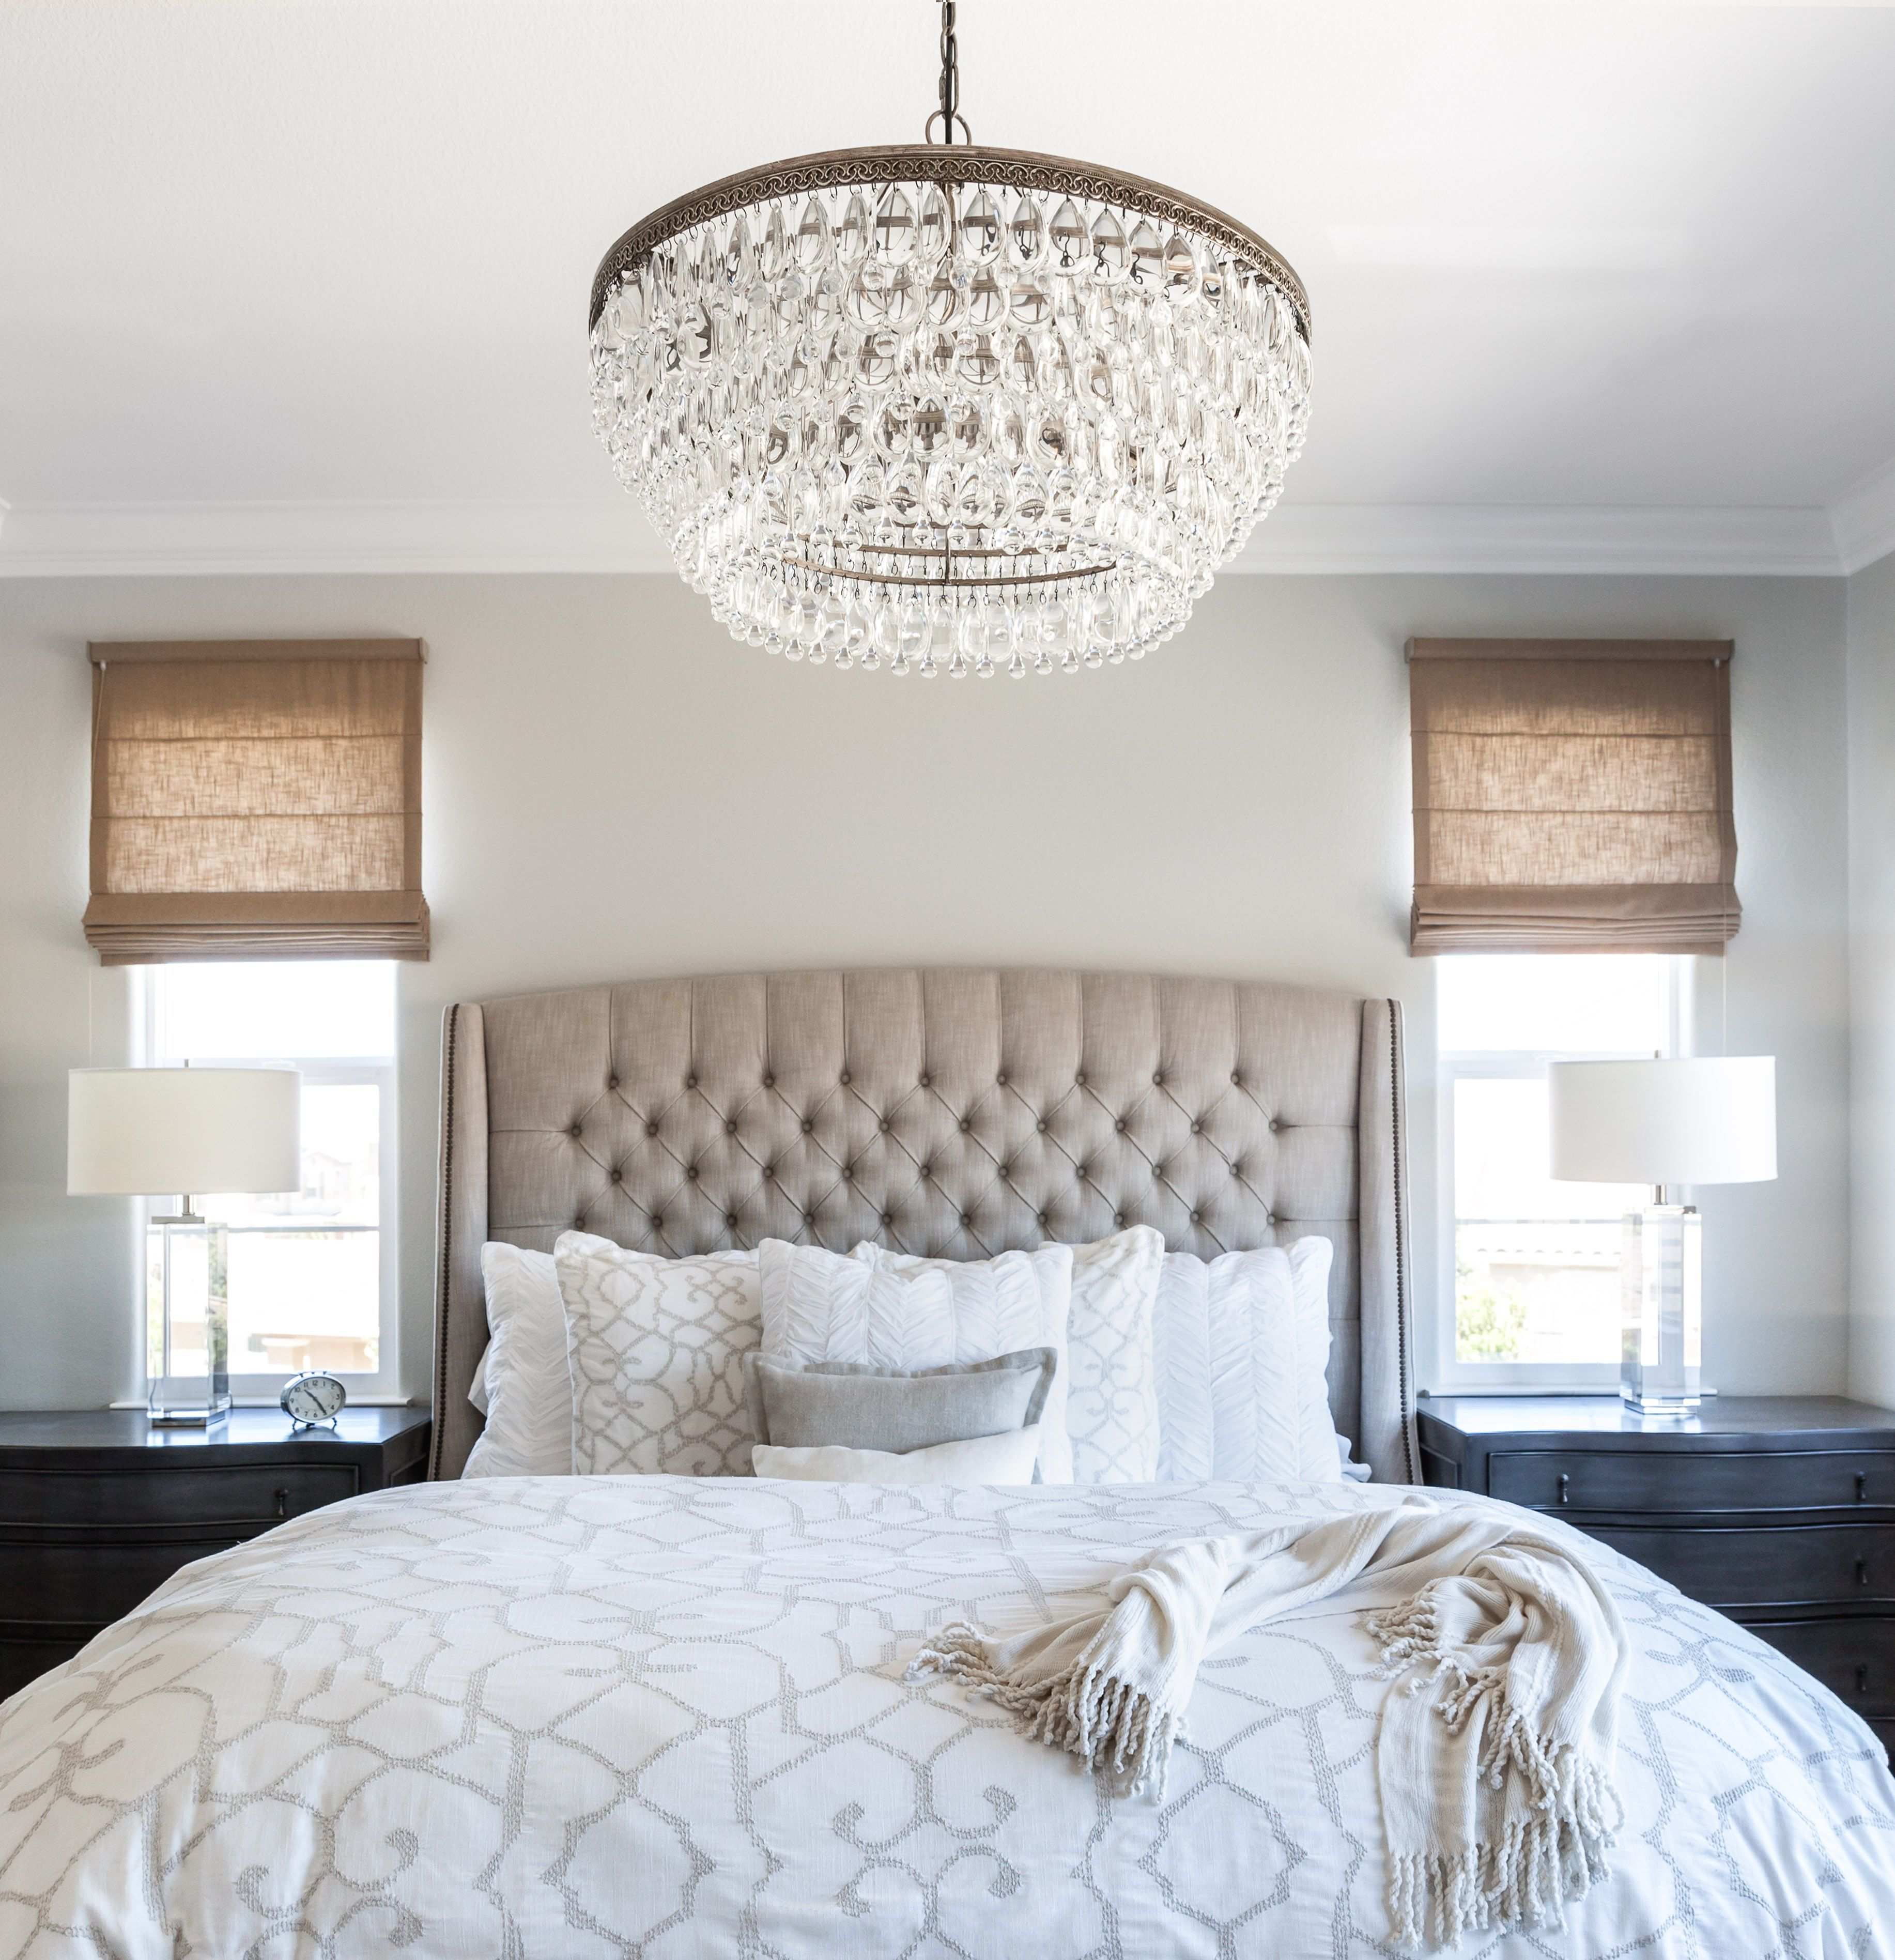 20 Bedroom Chandelier Designs Decorating Ideas: Beautiful Small Room Chandelier Ideas Design